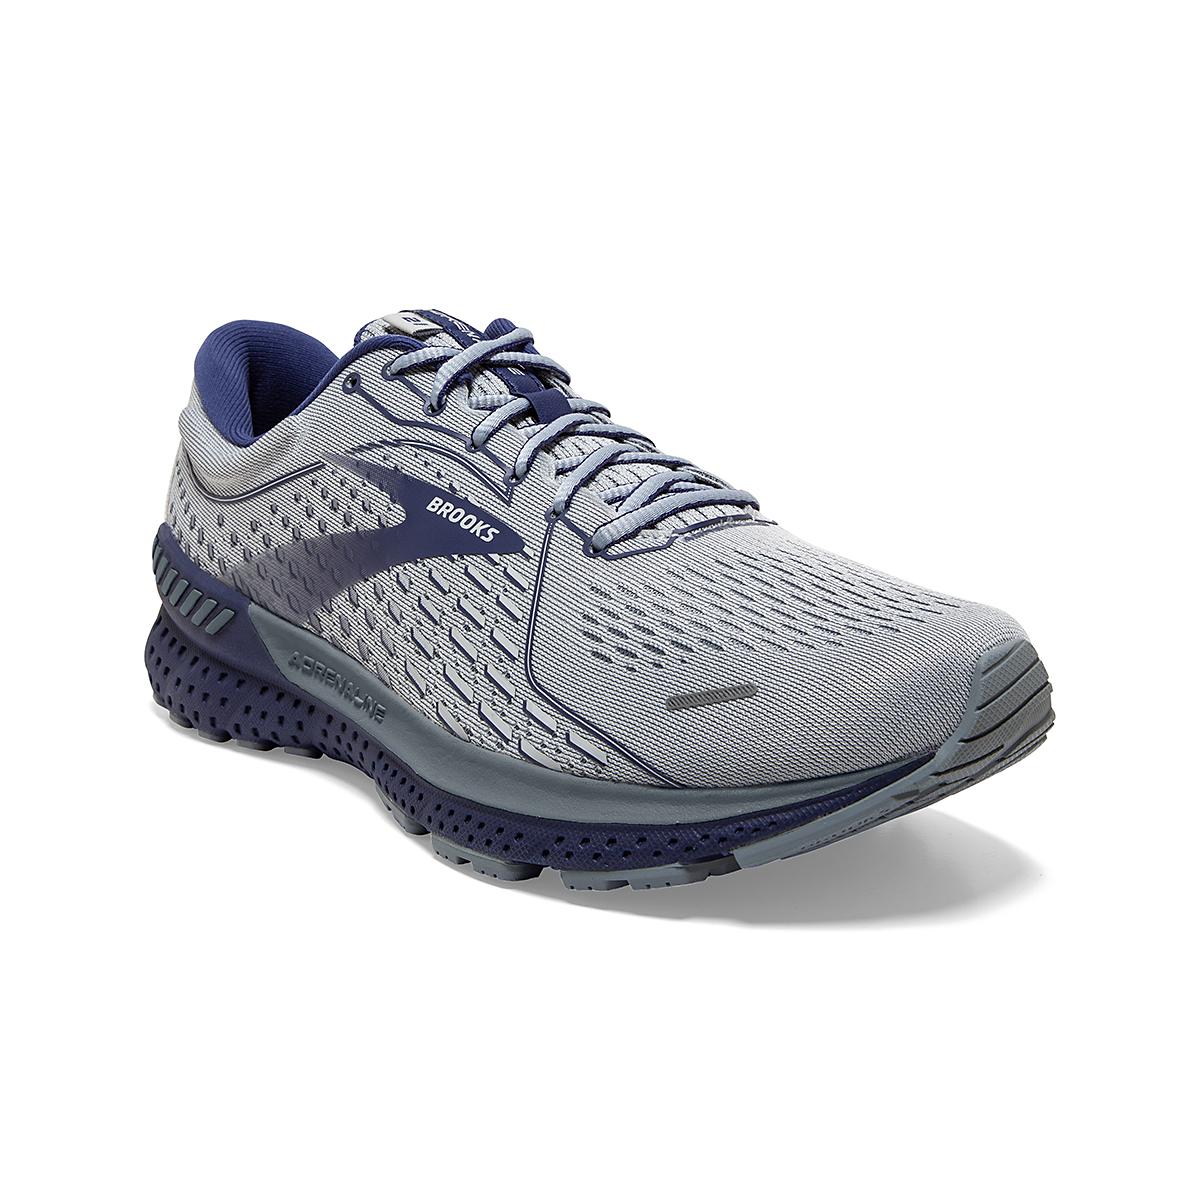 Men's Brooks Adrenaline GTS 21 Running Shoe - Color: Grey/Tradewinds - Size: 7 - Width: Regular, Grey/Tradewinds, large, image 3